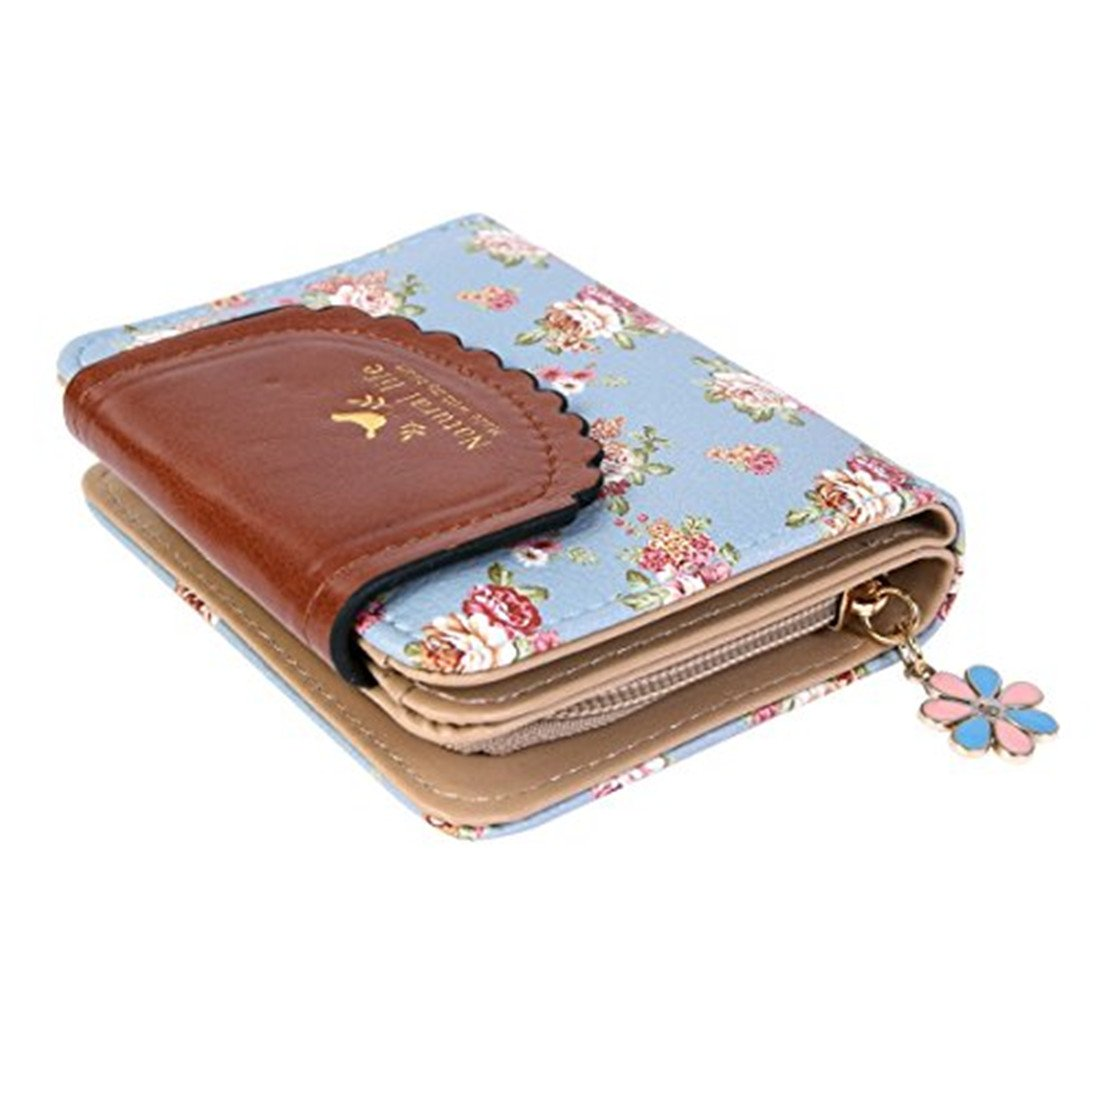 Amazon.com: Despacho. Para mujer pequeña portafolios lindo ...